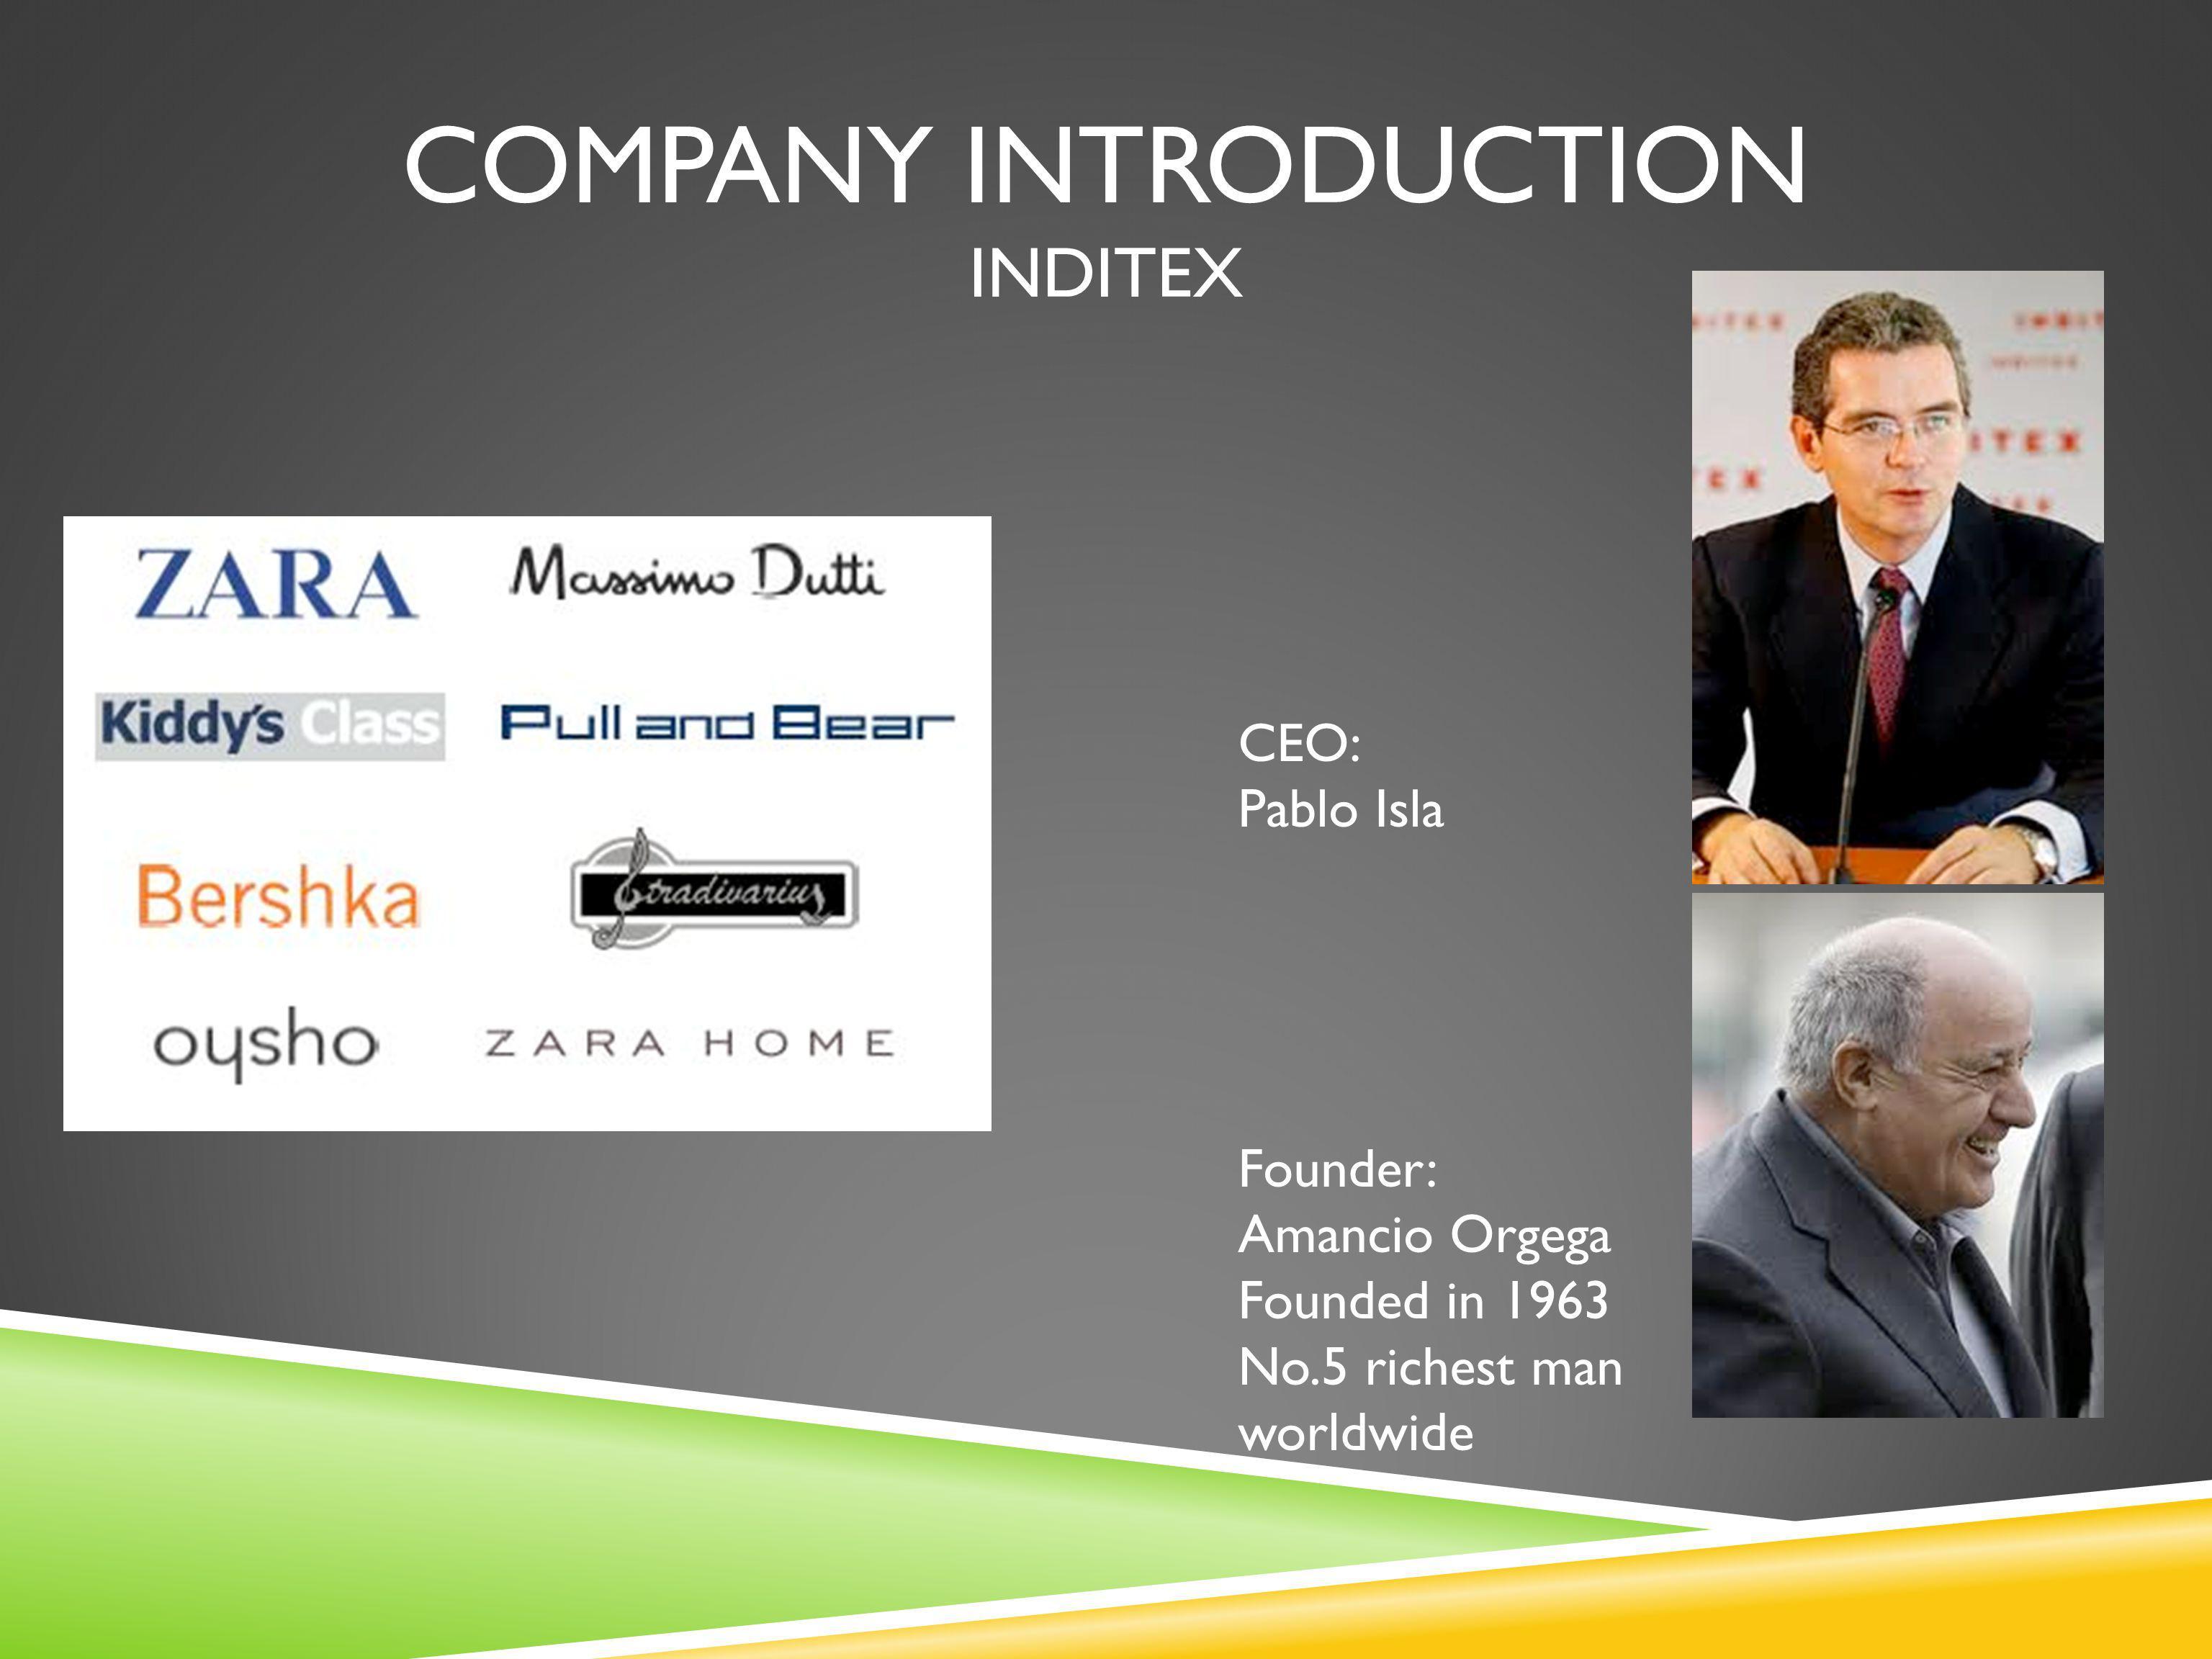 COMPANY INTRODUCTION INDITEX Founder: Amancio Orgega Founded in 1963 No.5 richest man worldwide CEO: Pablo Isla